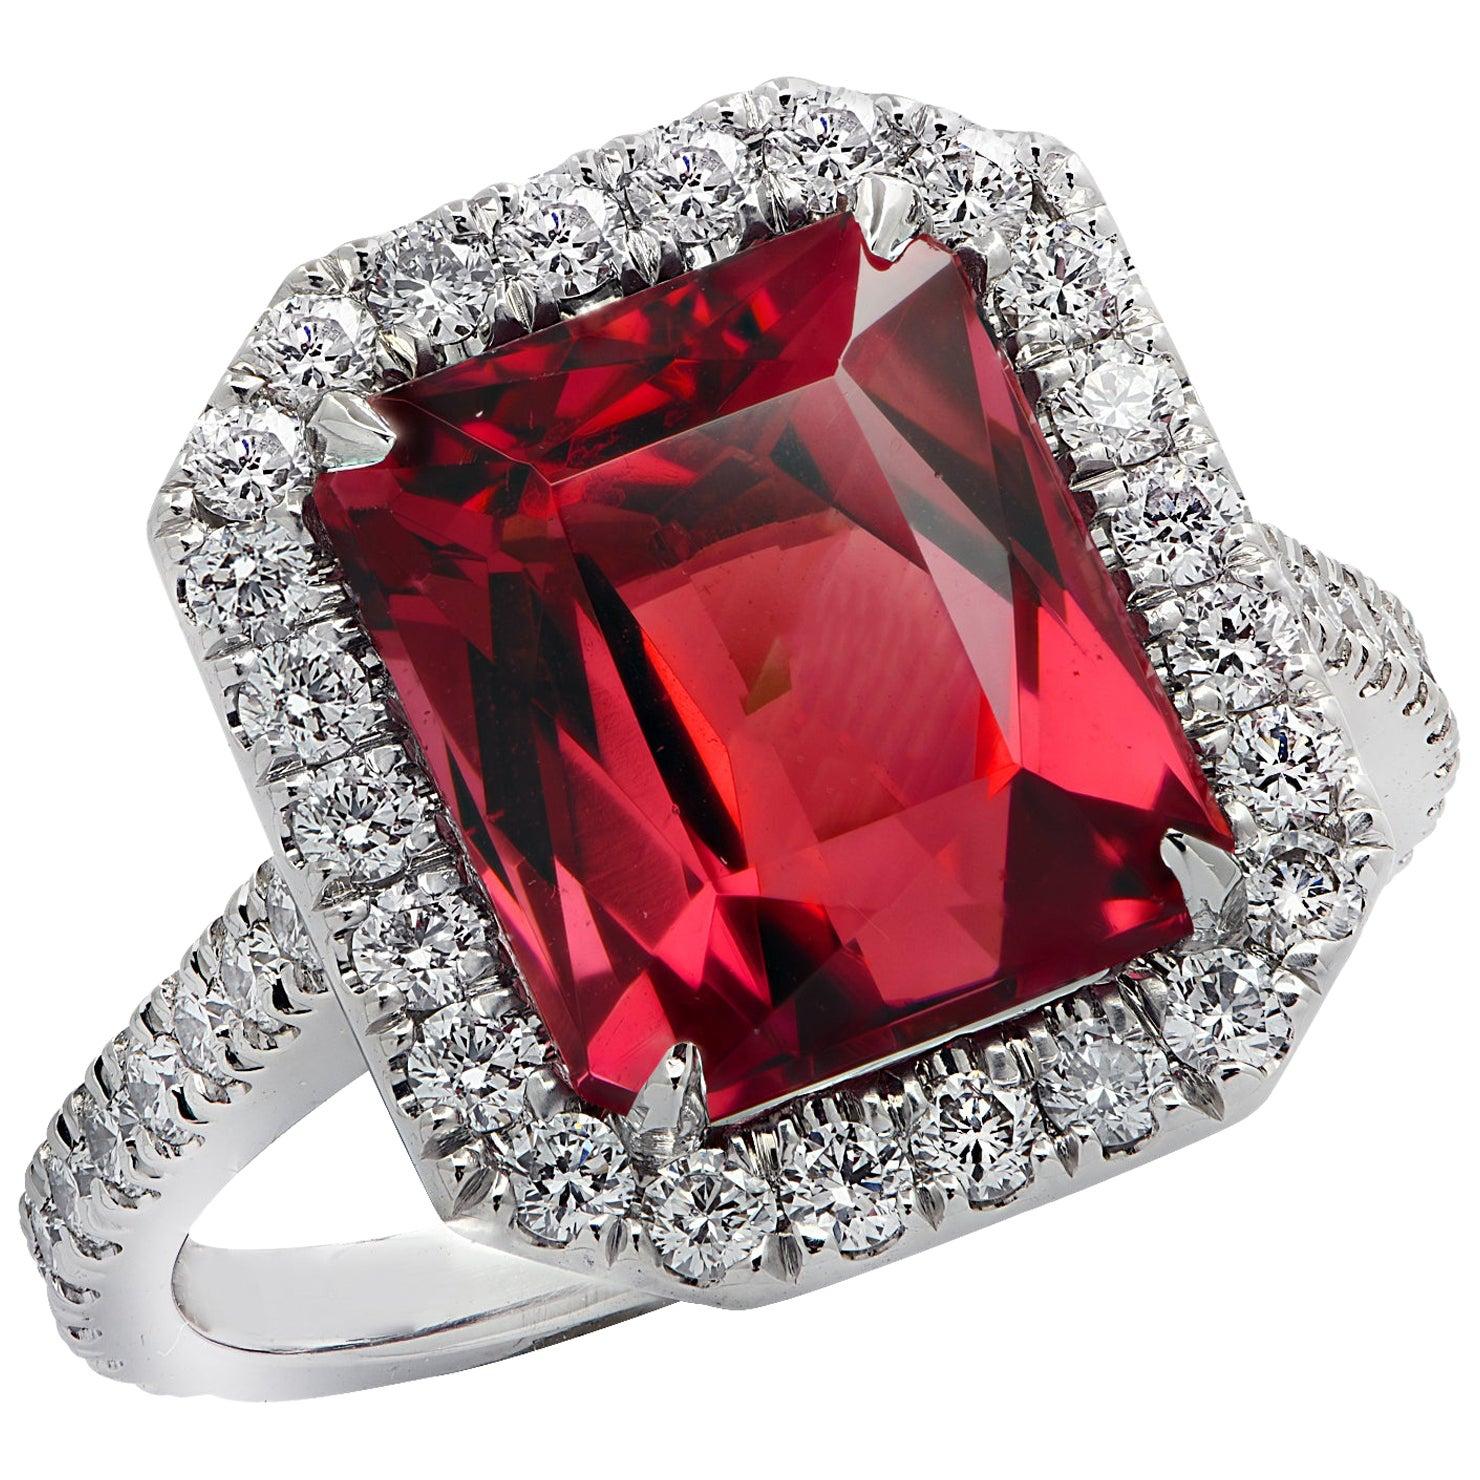 Vivid Diamonds 3.90 Carat Rubelite Tourmaline and Diamond Halo Engagement Ring